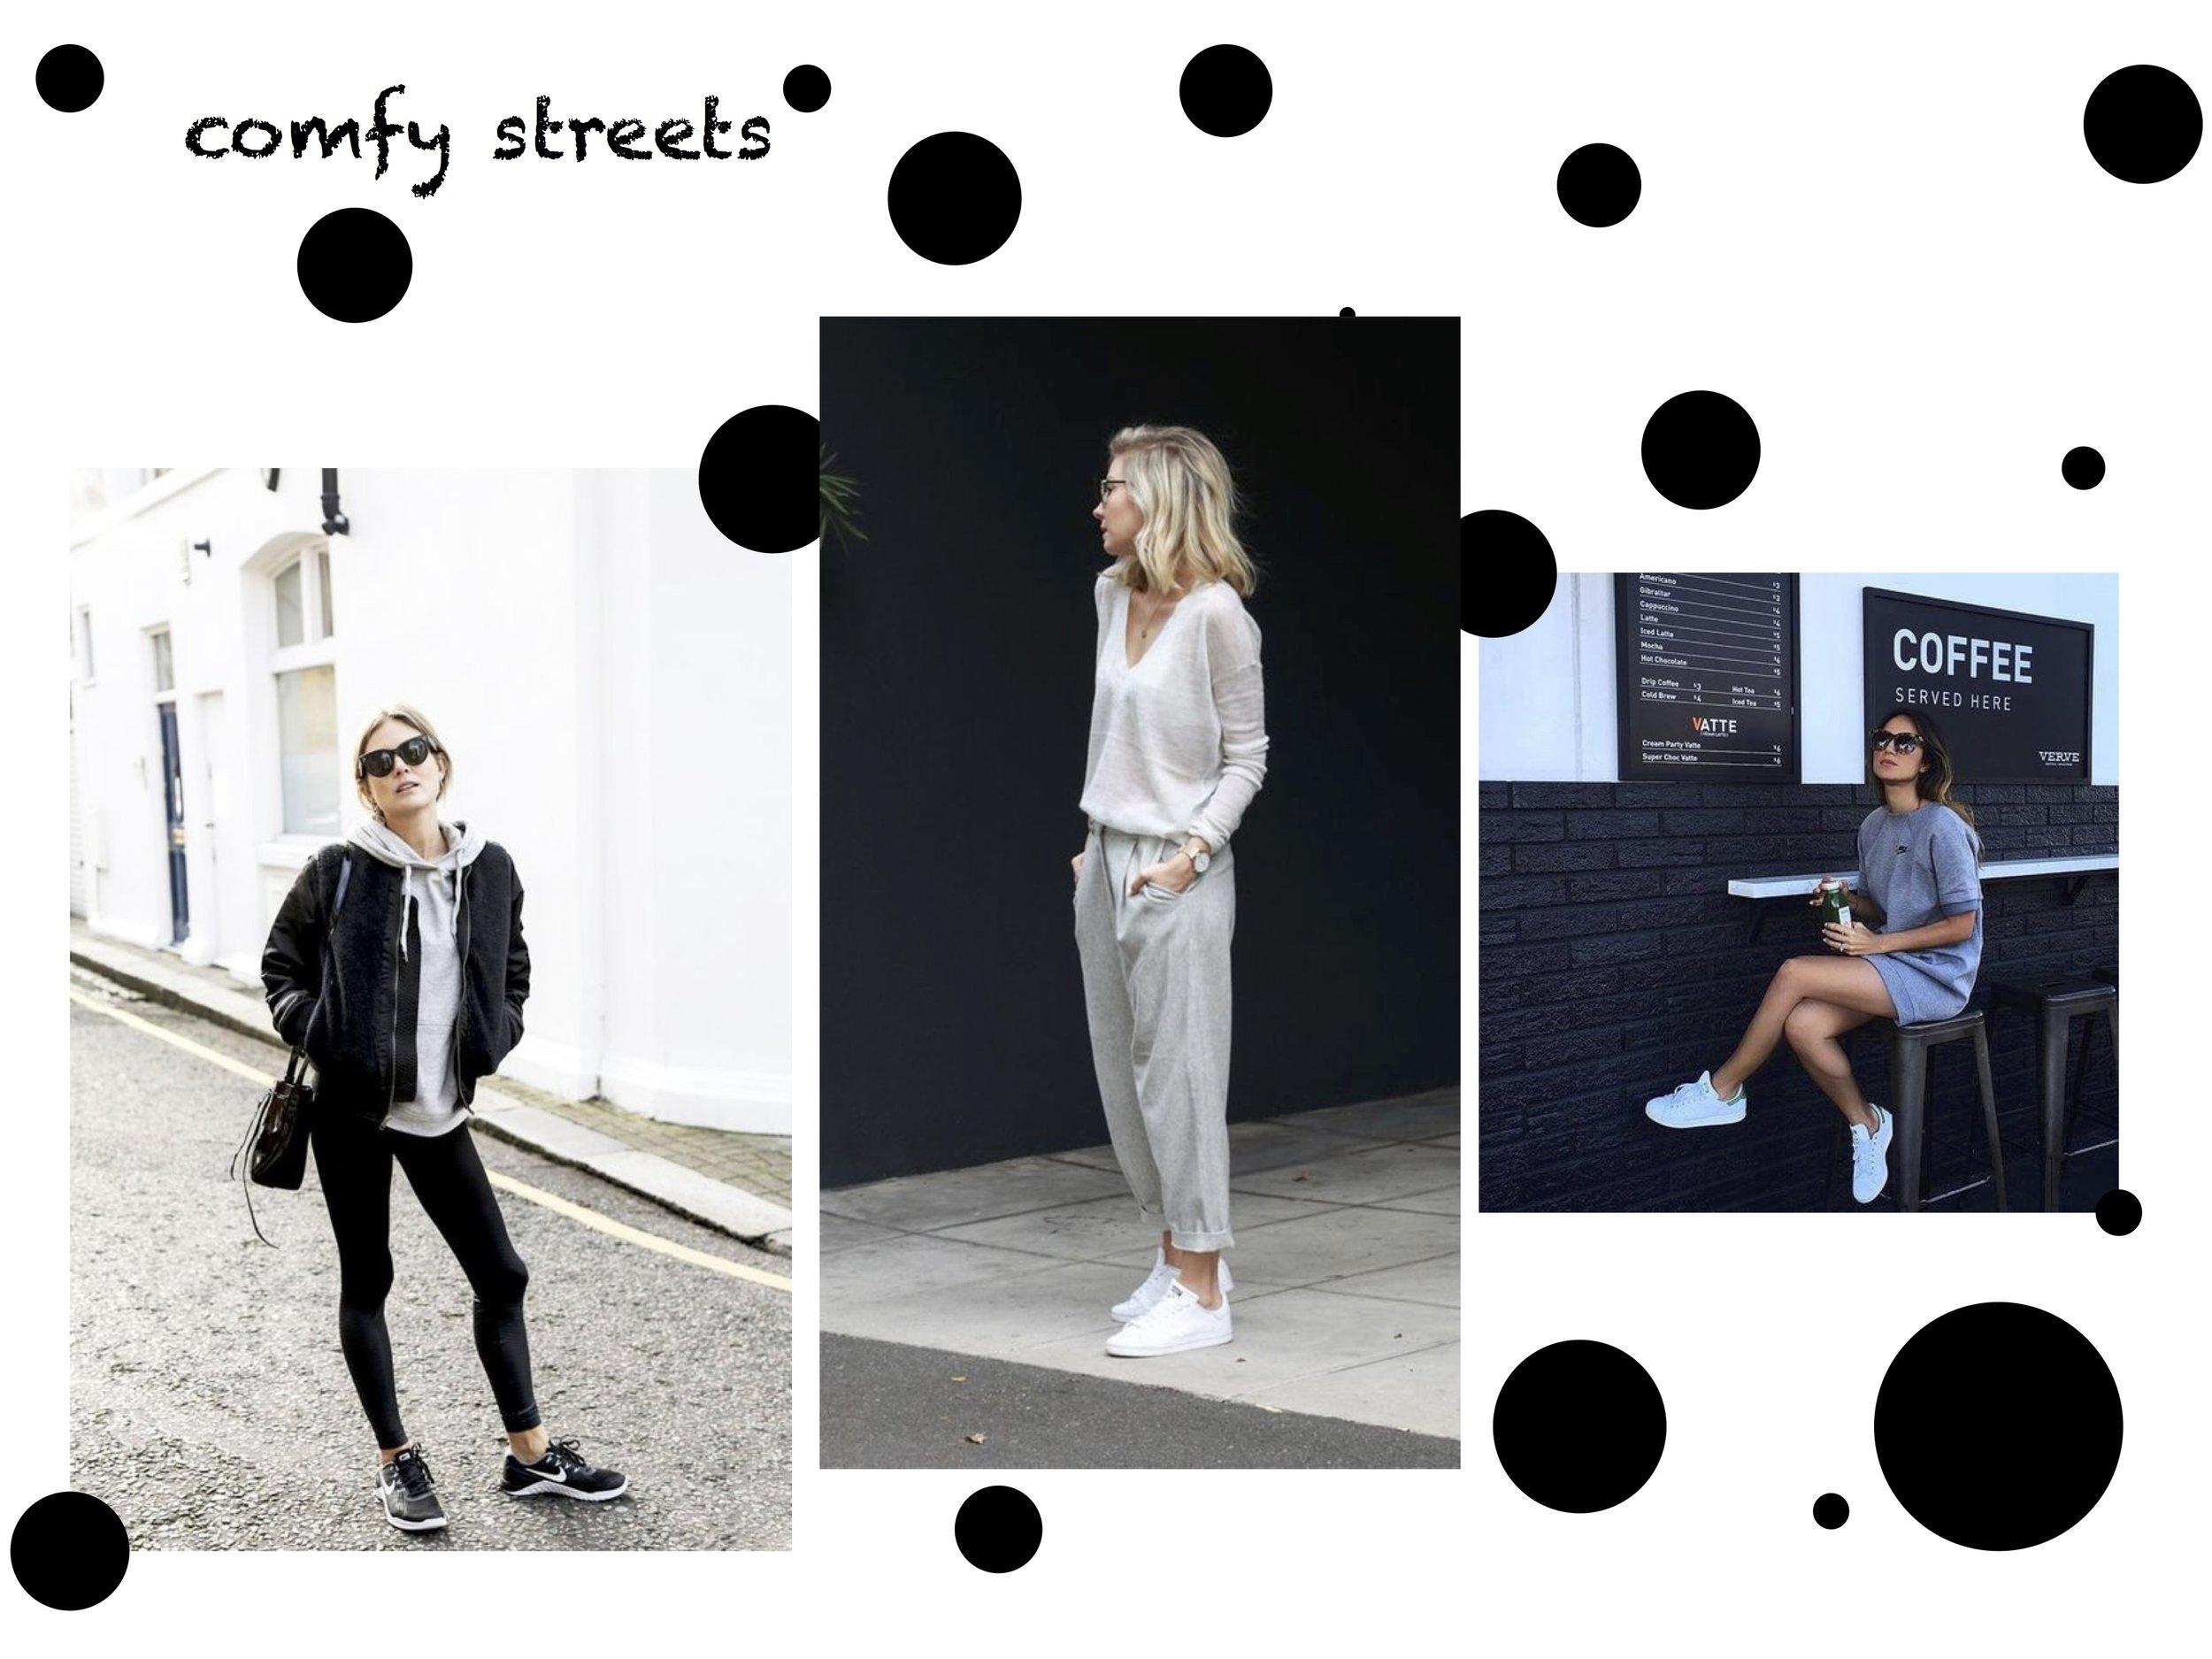 comfystreets.jpg